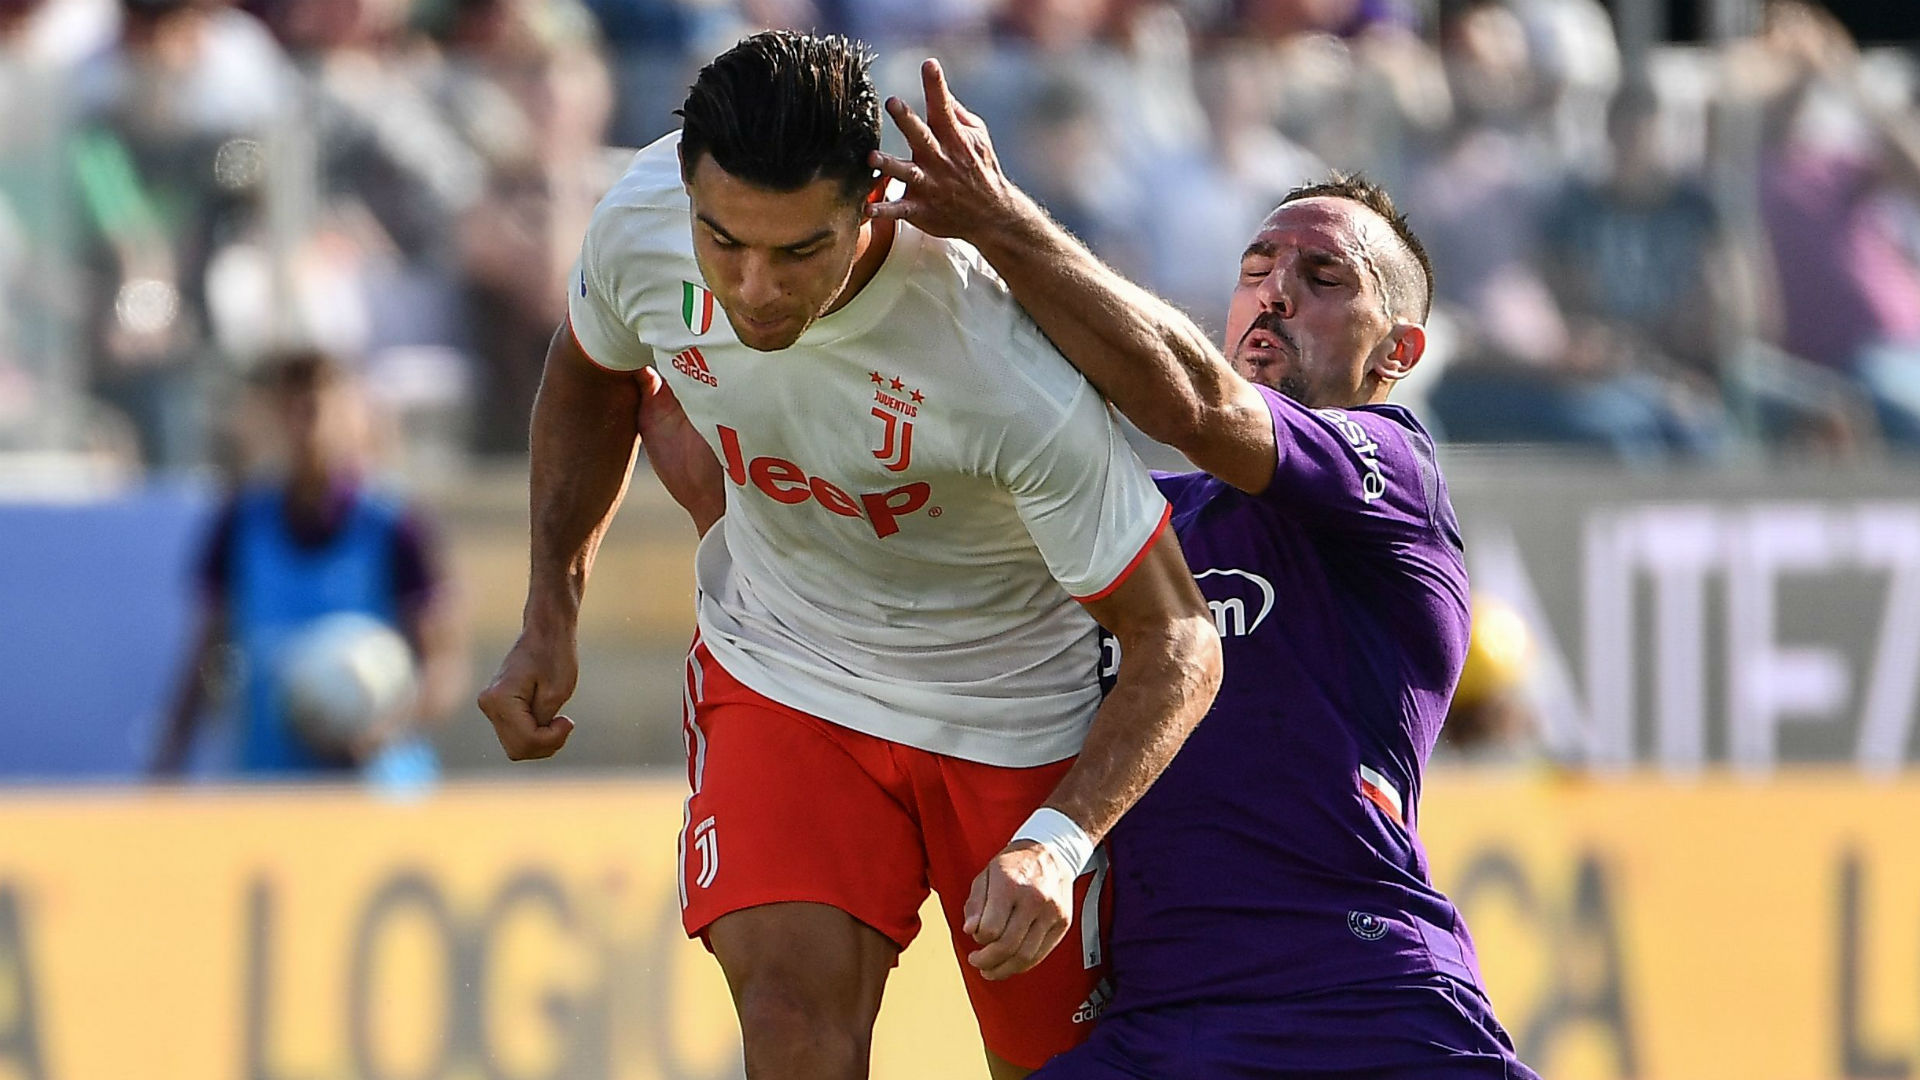 'Ribery at 36 was better than Ronaldo!' - Fiorentina owner gushes after veteran stars versus Juventus